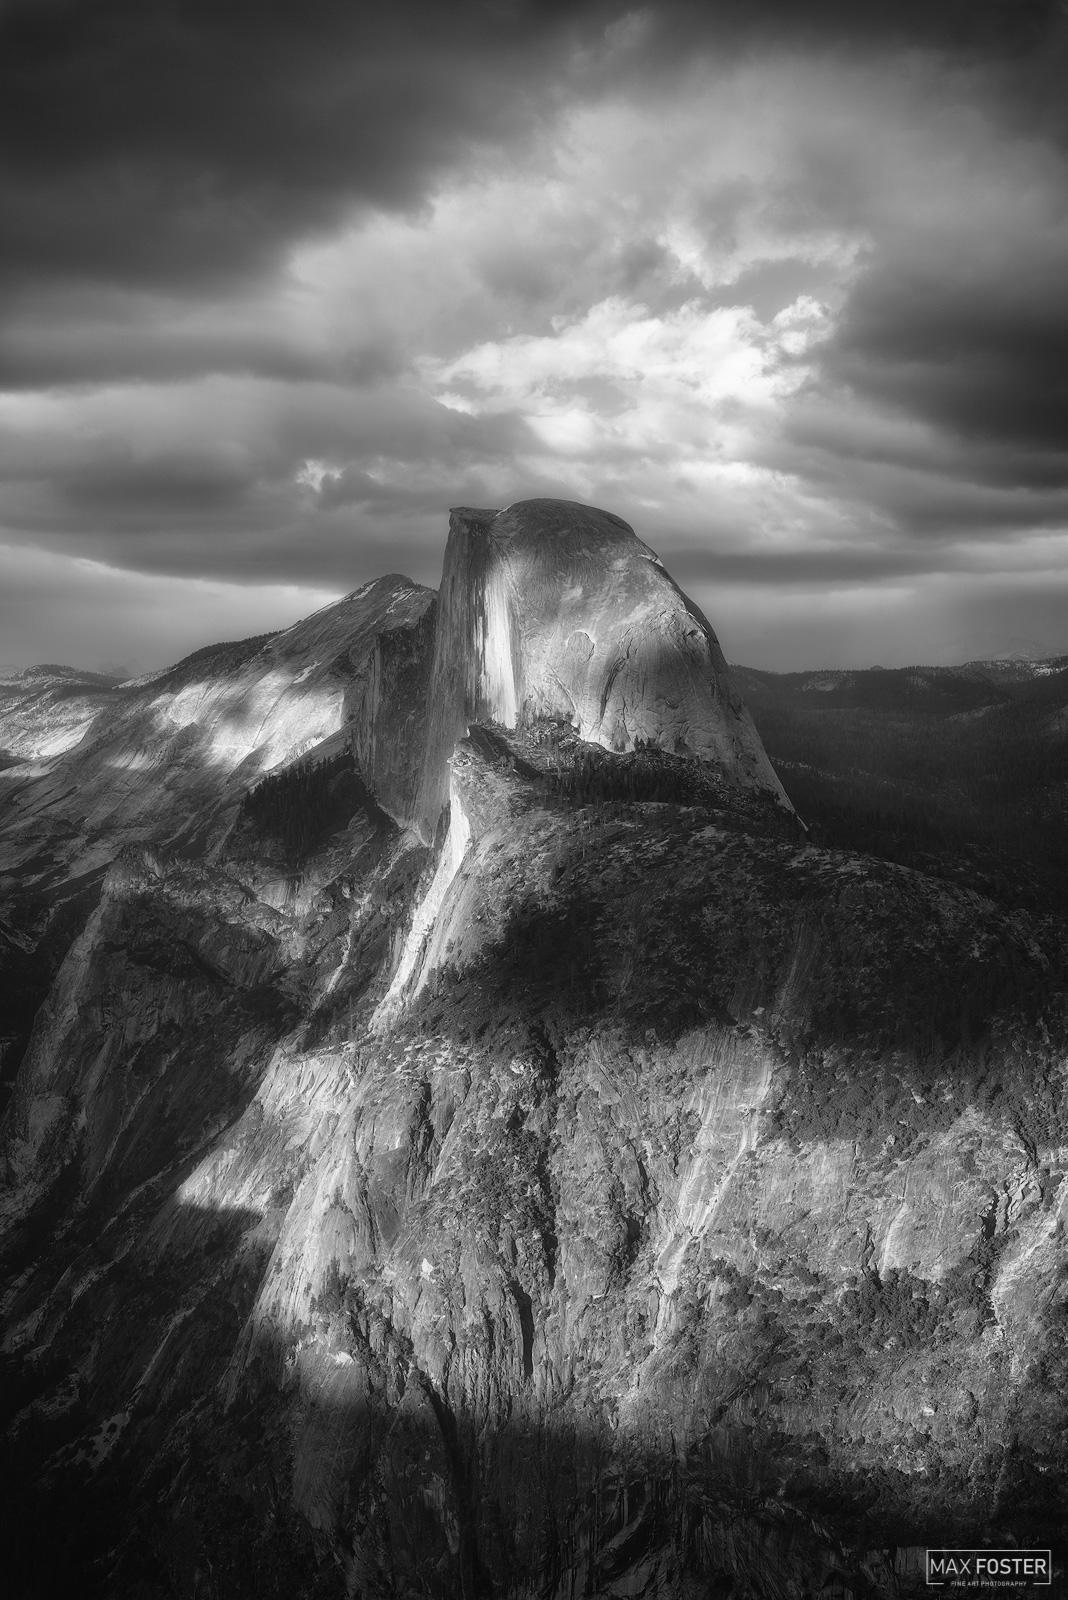 Yosemite National Park, California, Phantom, Half Dome, Yosemite Valley, Black and White, photo